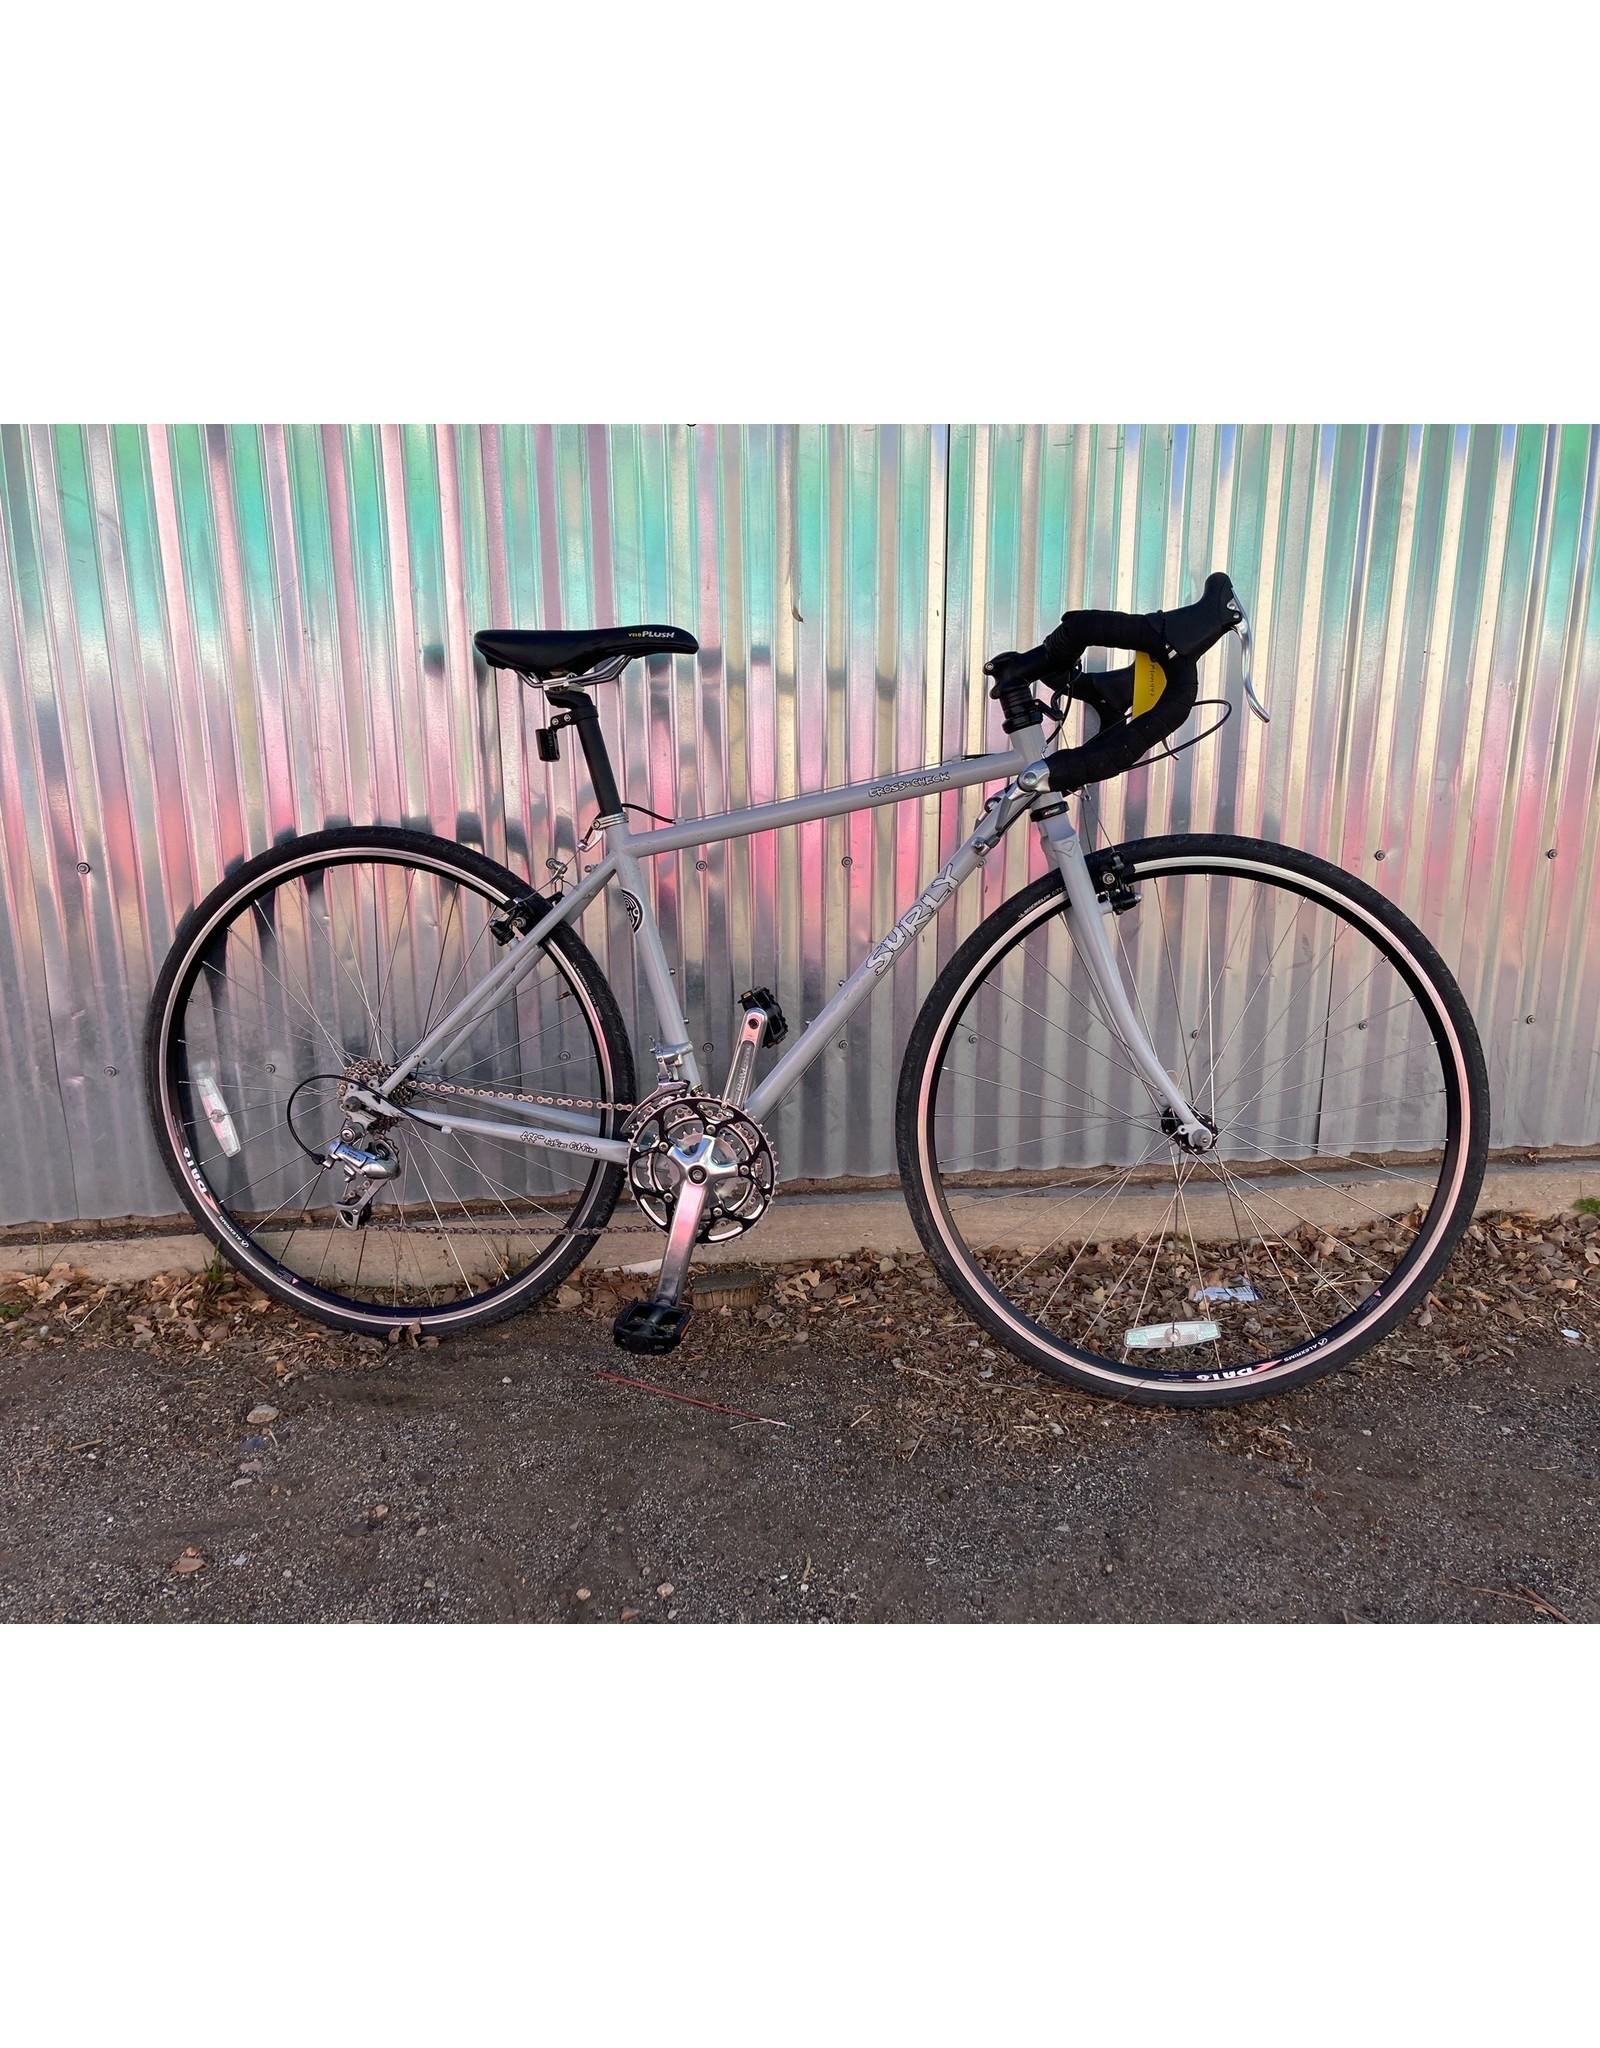 Used Bikes Used Bike 526 - Surly Cross Check 46cm